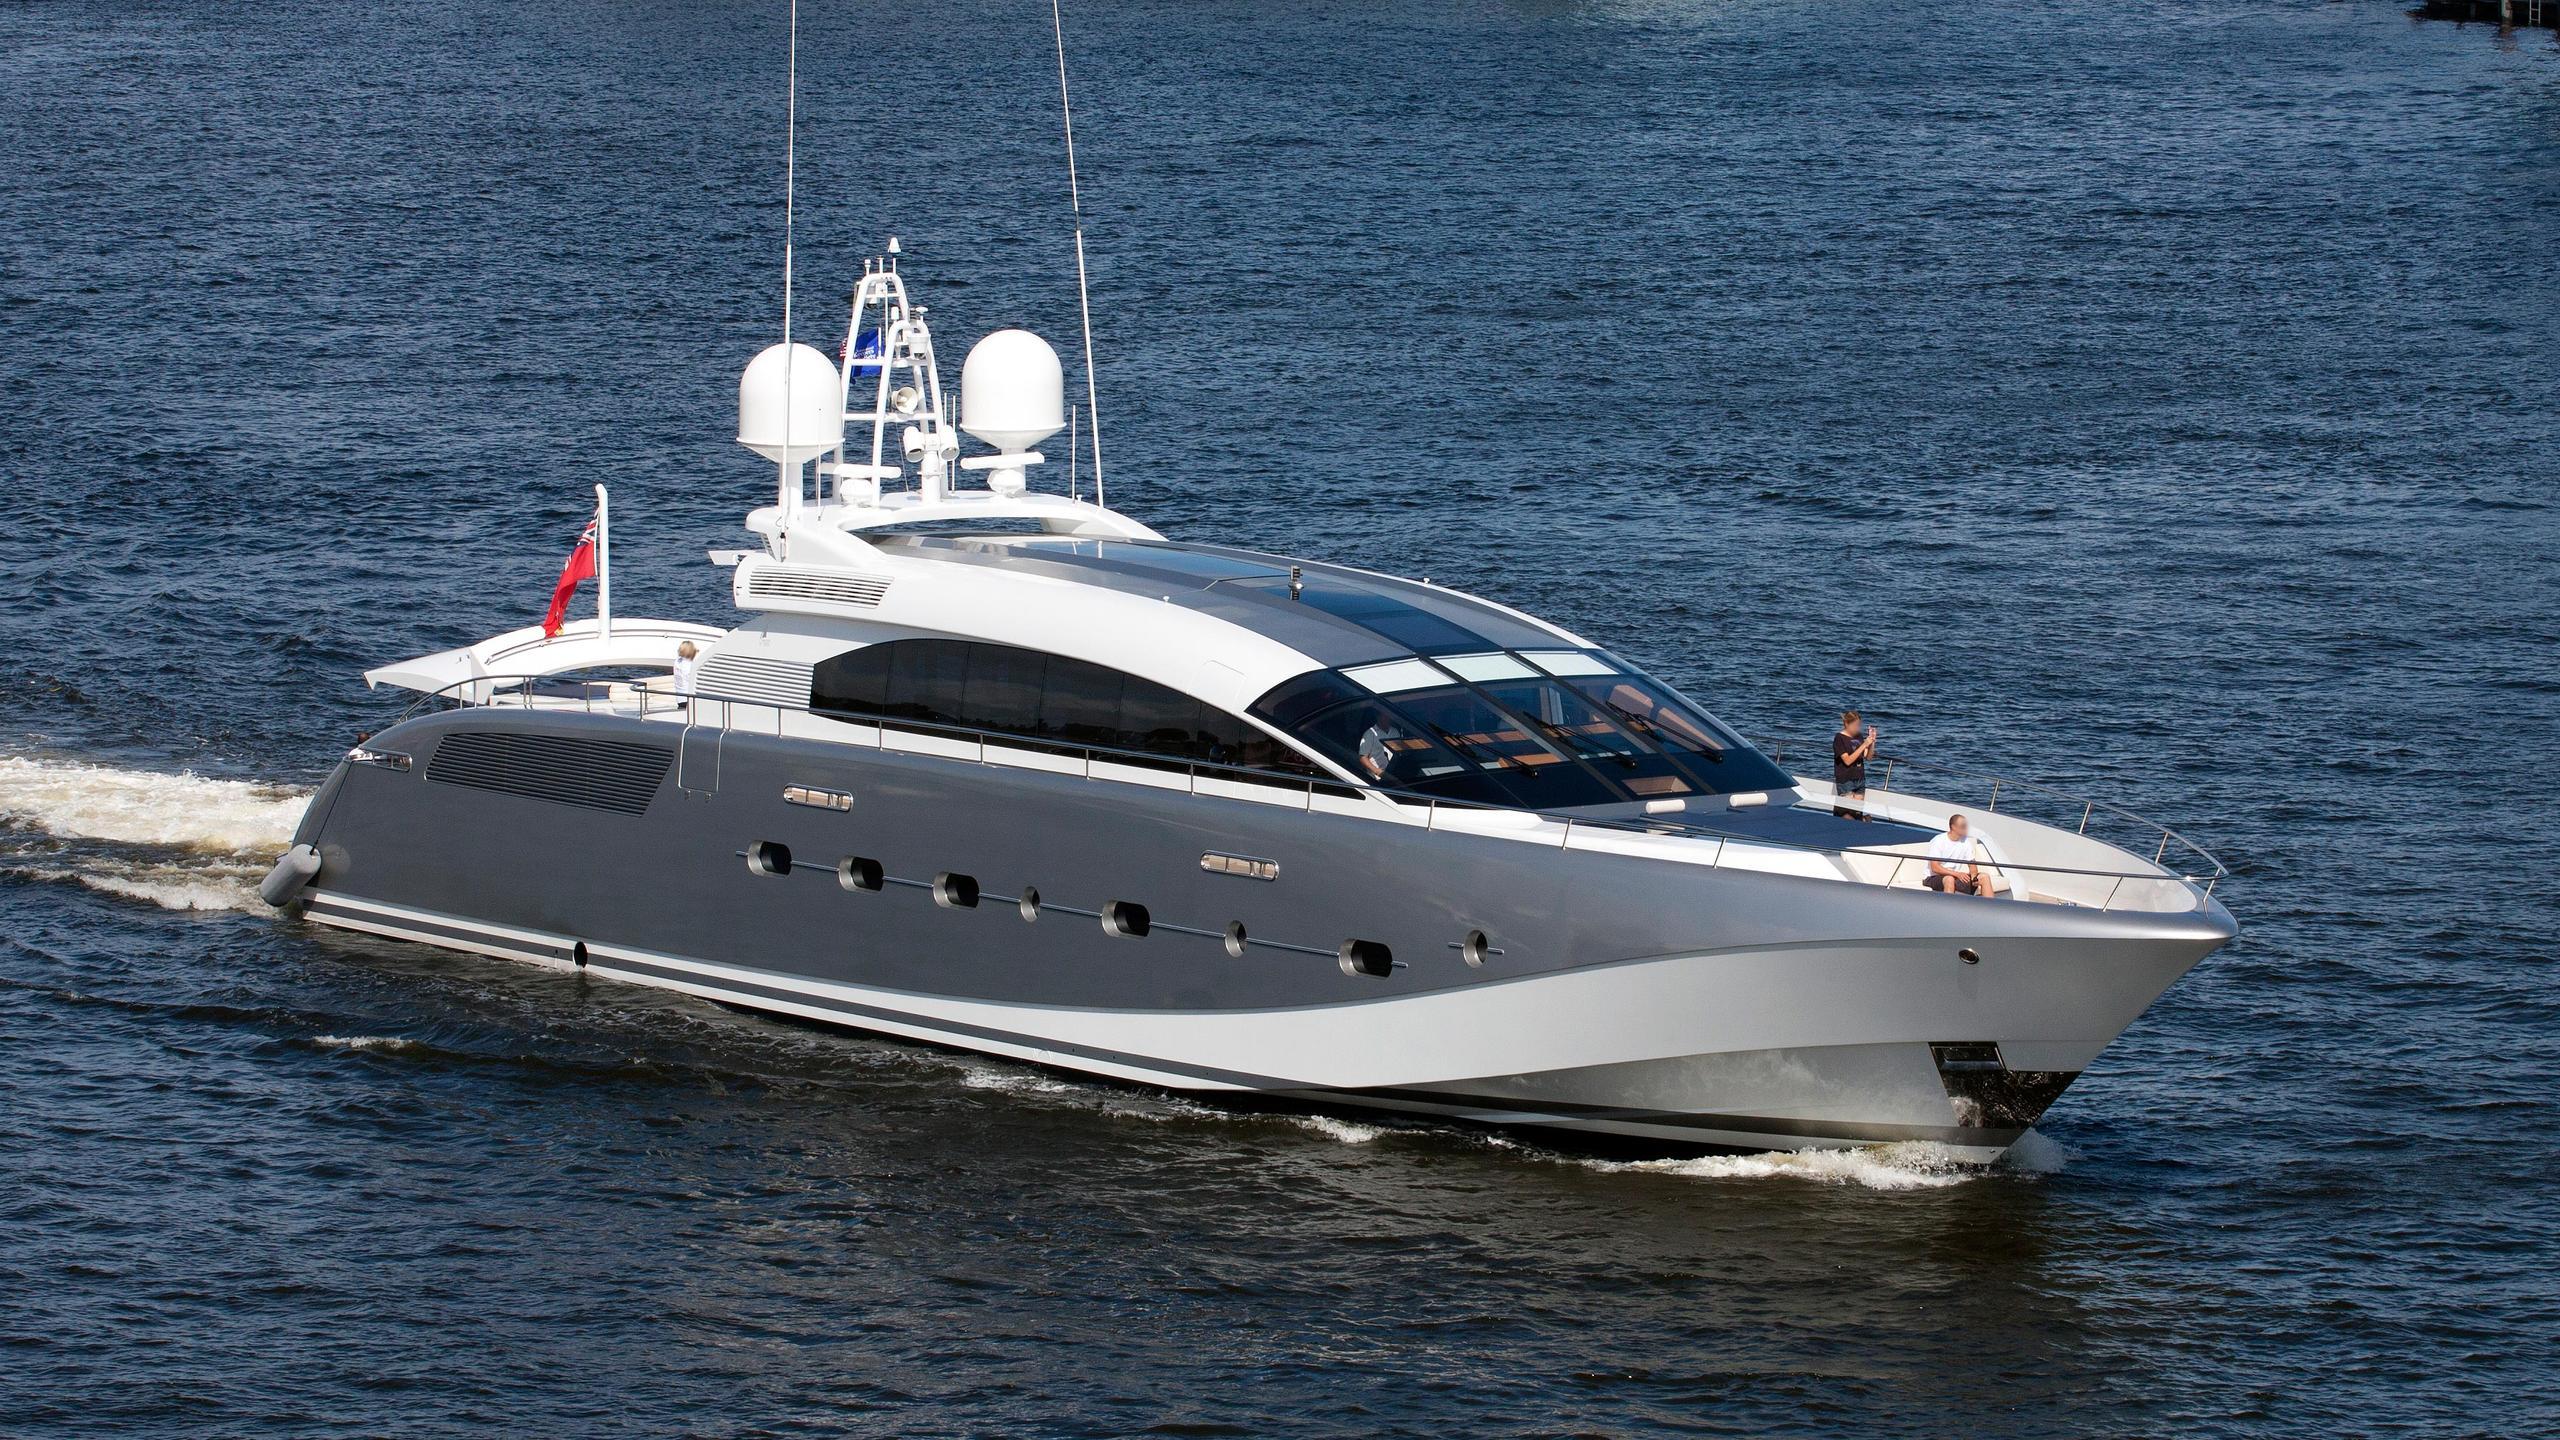 butterfly-motor-yacht-danish-2011-38m-half-profile